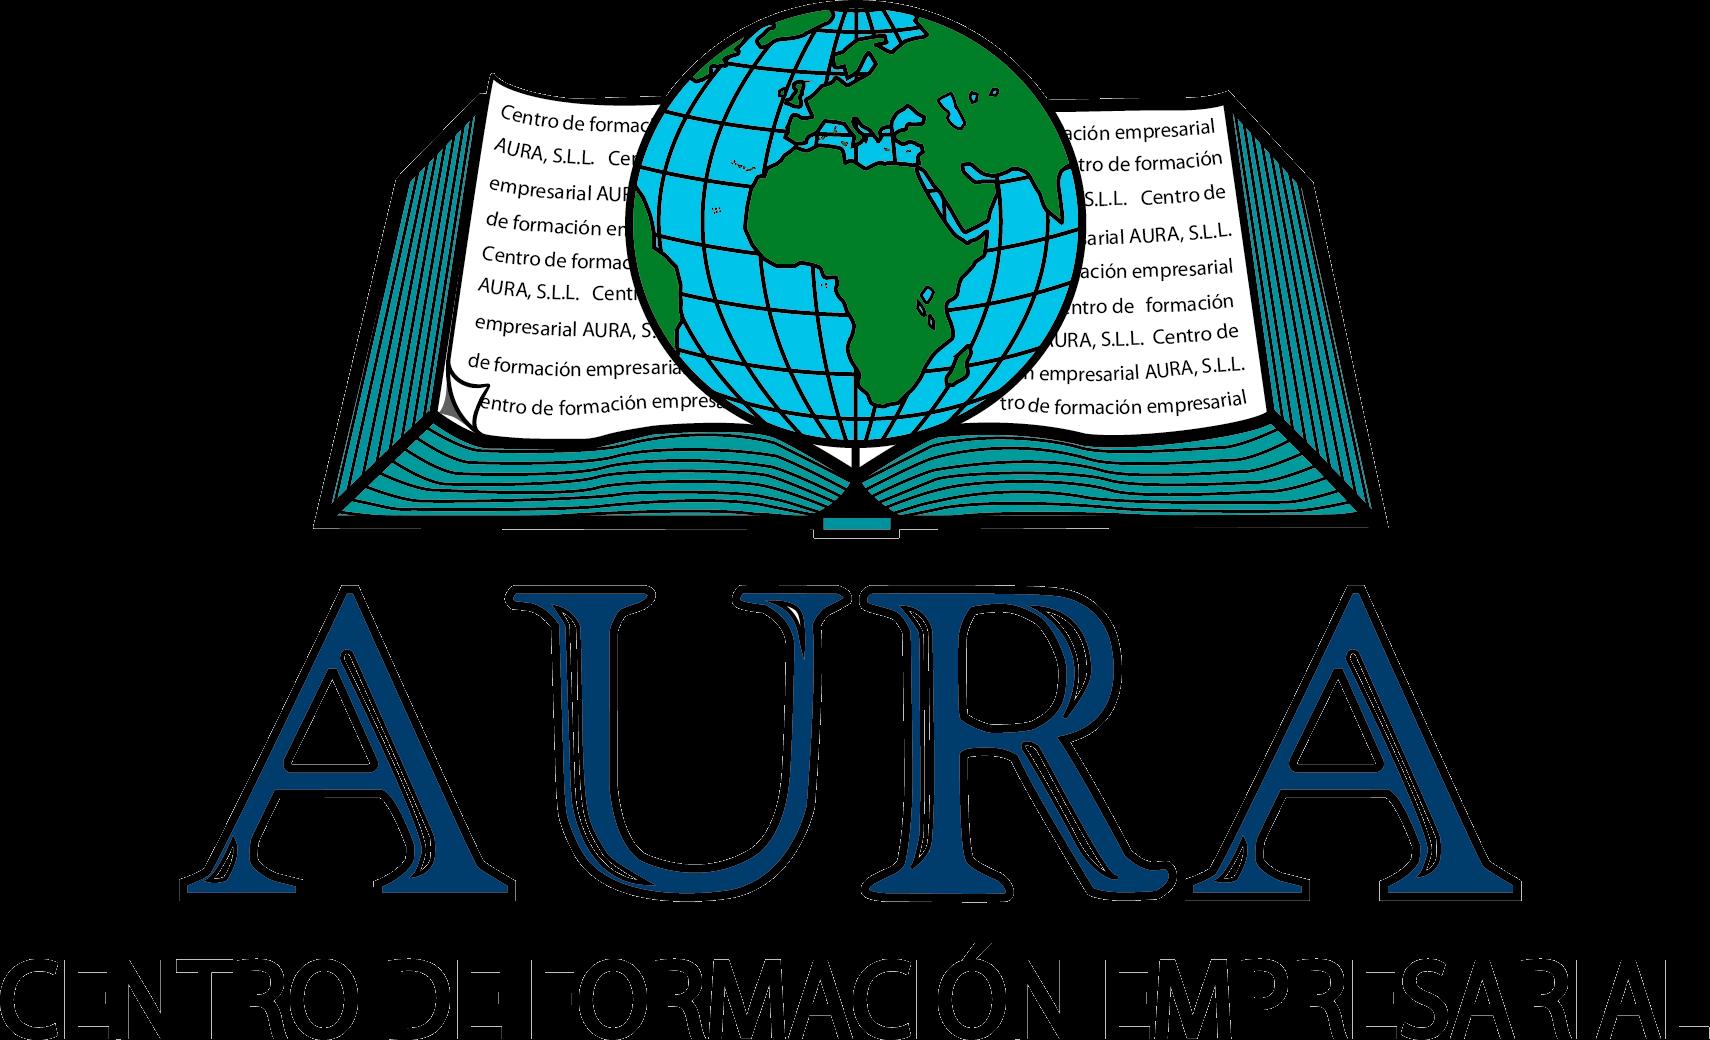 Aura Formacion